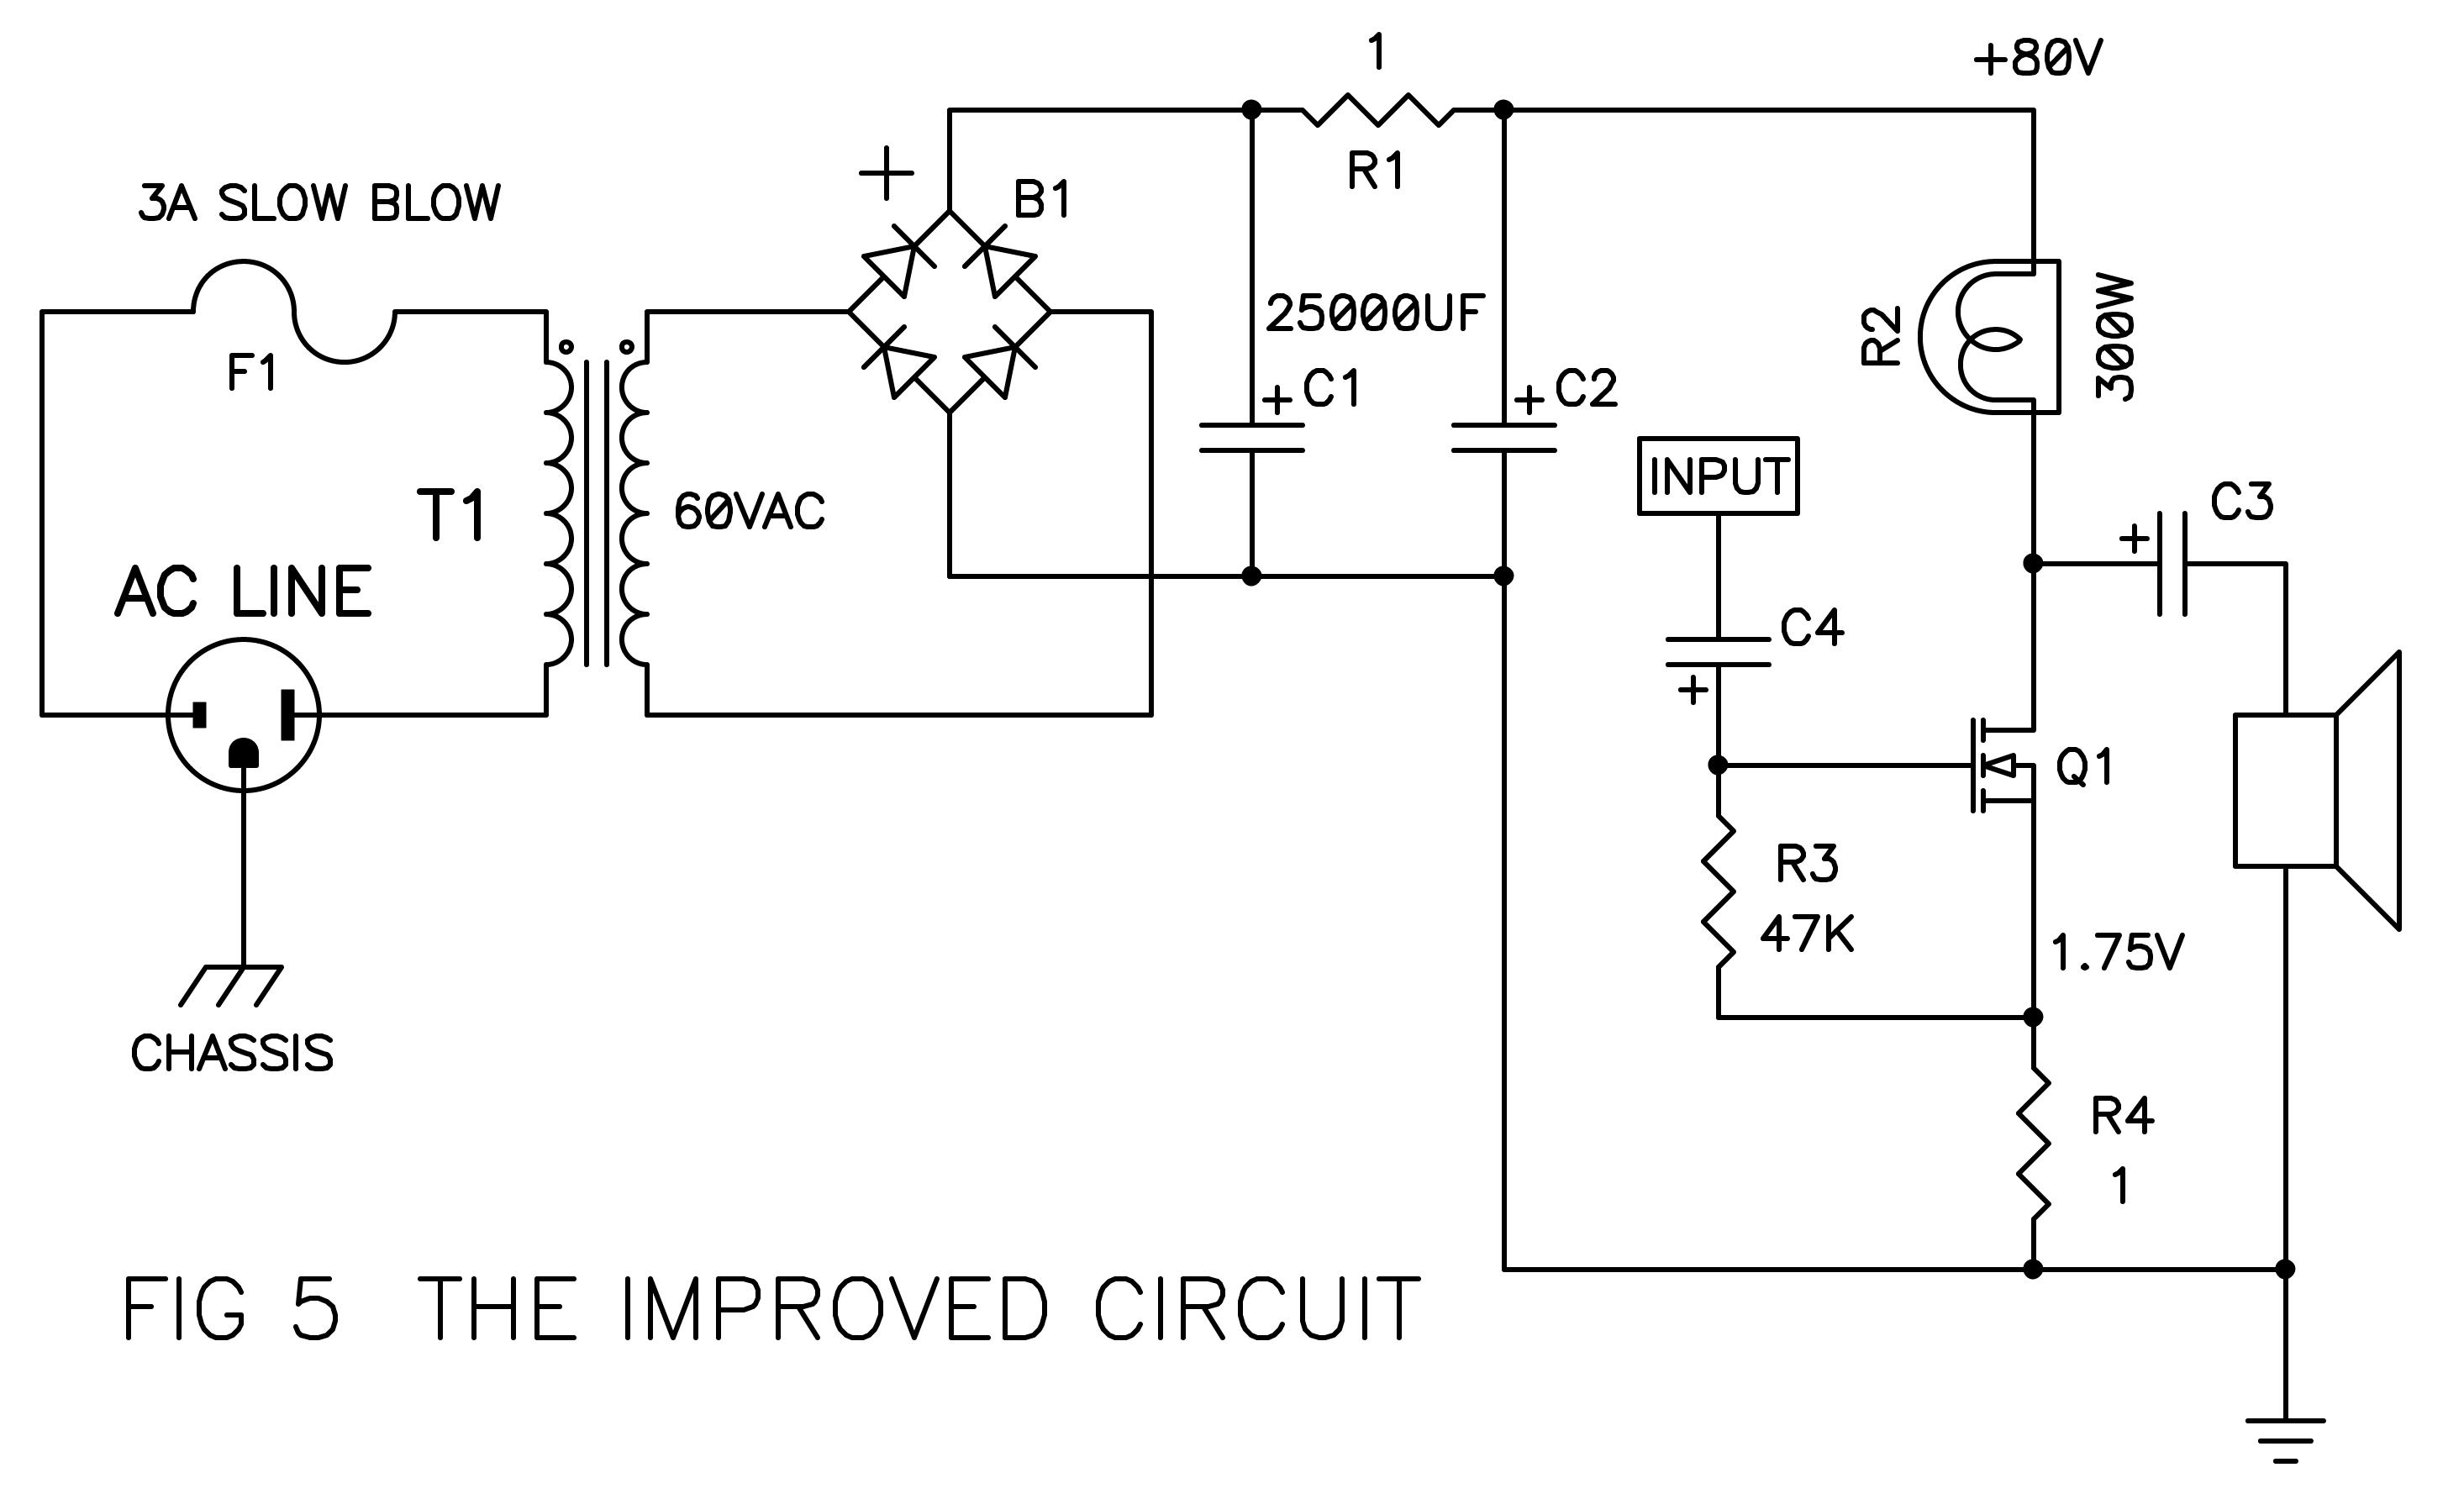 De Lite Amplifier Diyaudio Simple Audio Preamplifier Circuit Using Single Transistor 2n3904